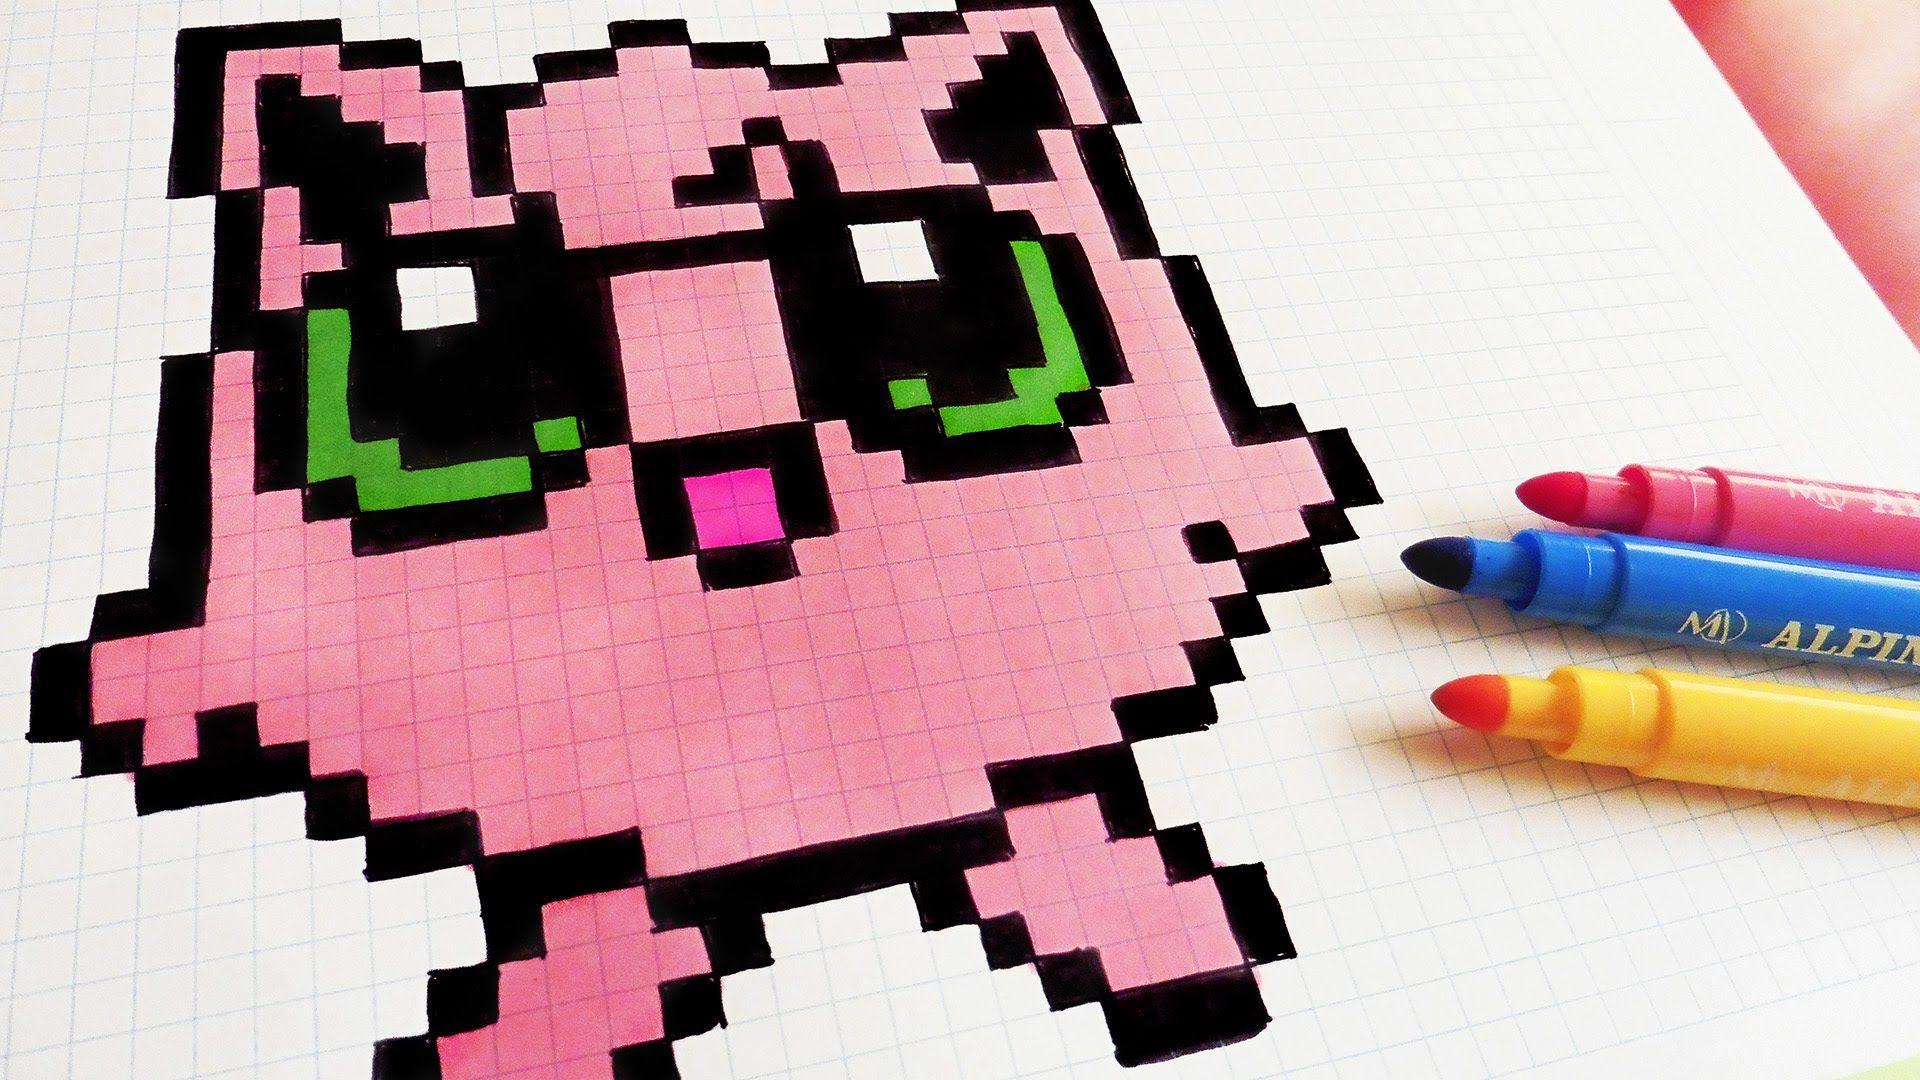 Handmade Pixel Art How To Draw Jigglypuff Pixelart